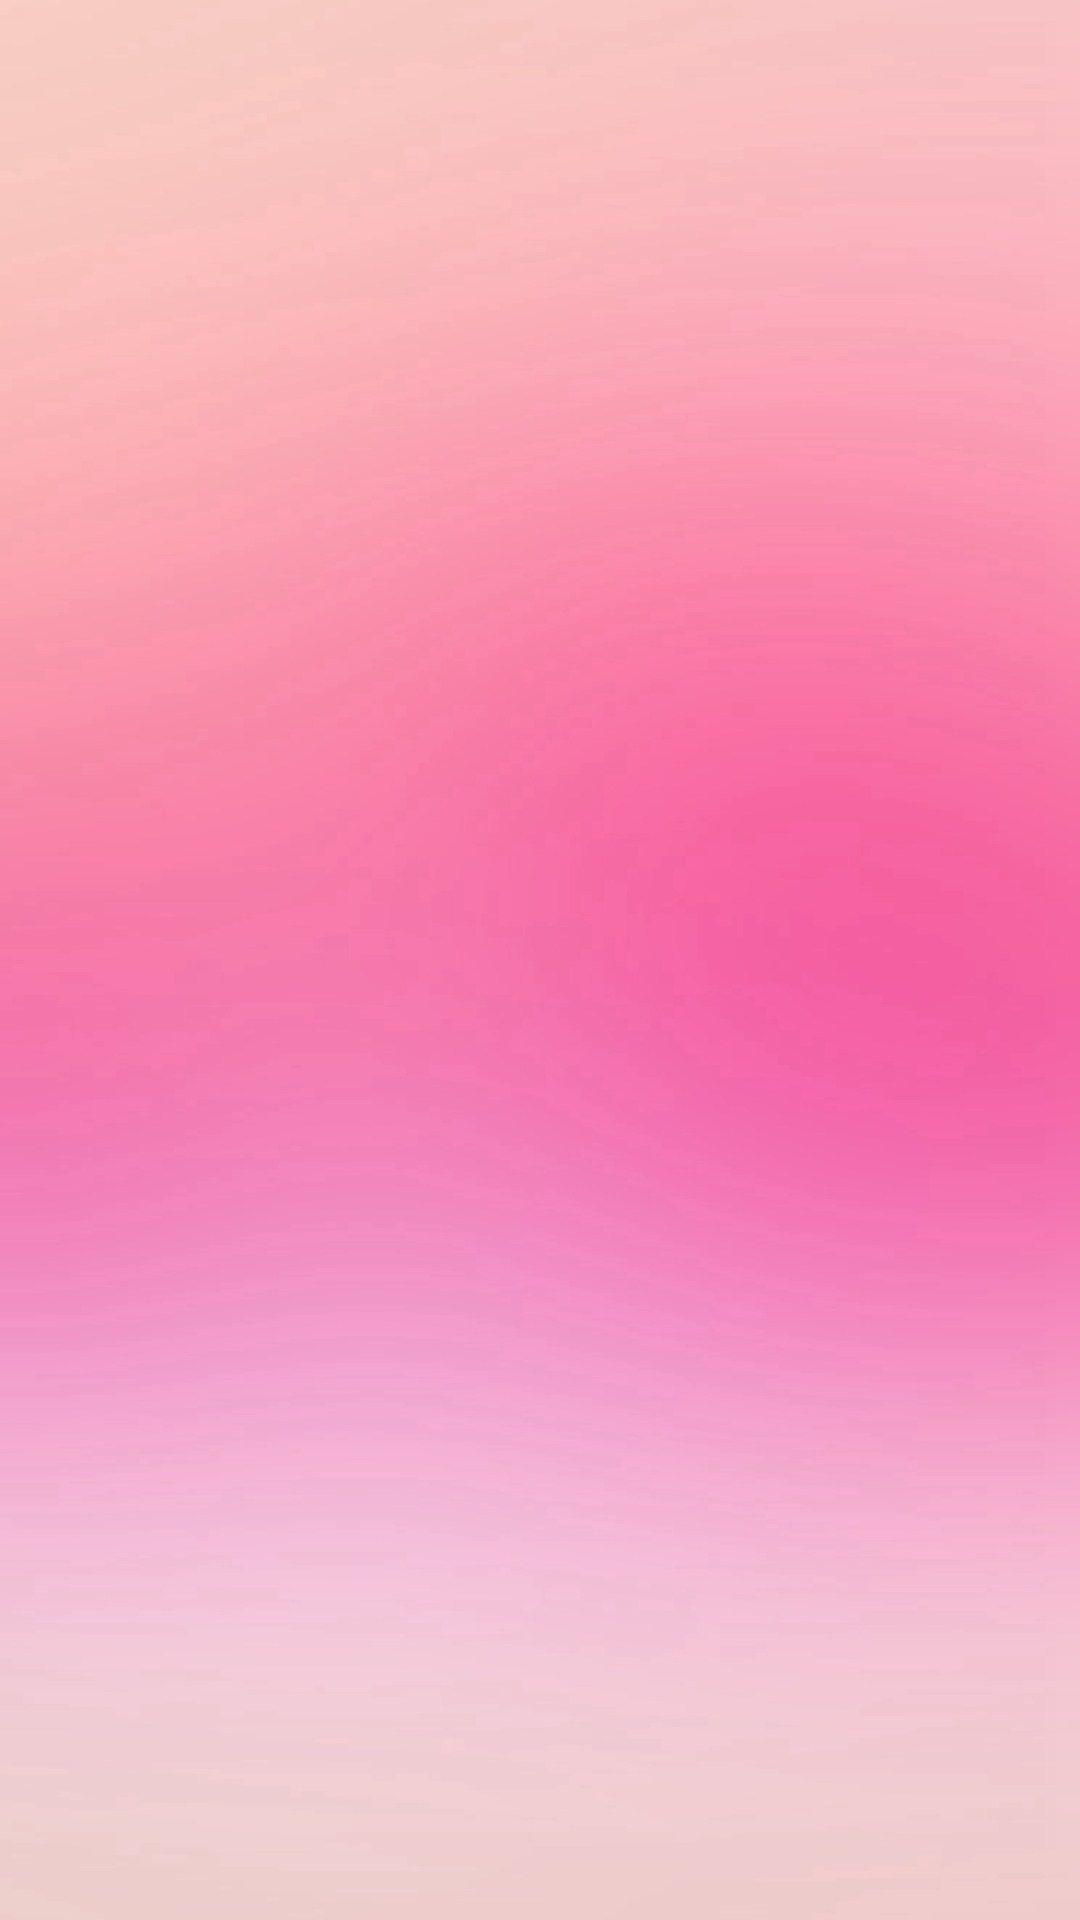 Hình nền iPhone 1080x1920 Light Pink Aesthetic